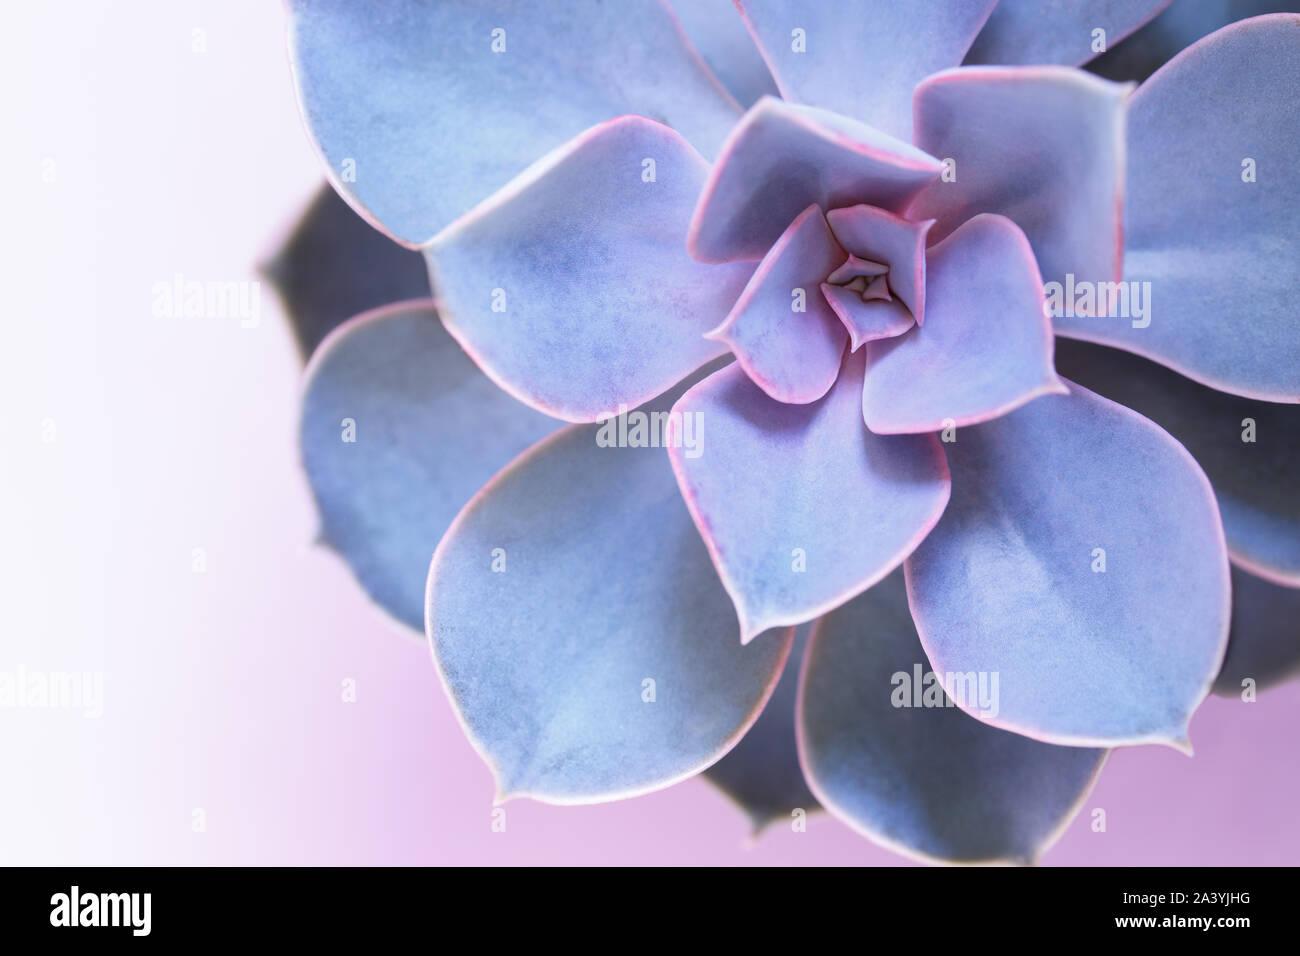 Succulent Purple Perle Von Nurnberg Trendy House Plants On Pink Background Close Up Macro Stock Photo Alamy